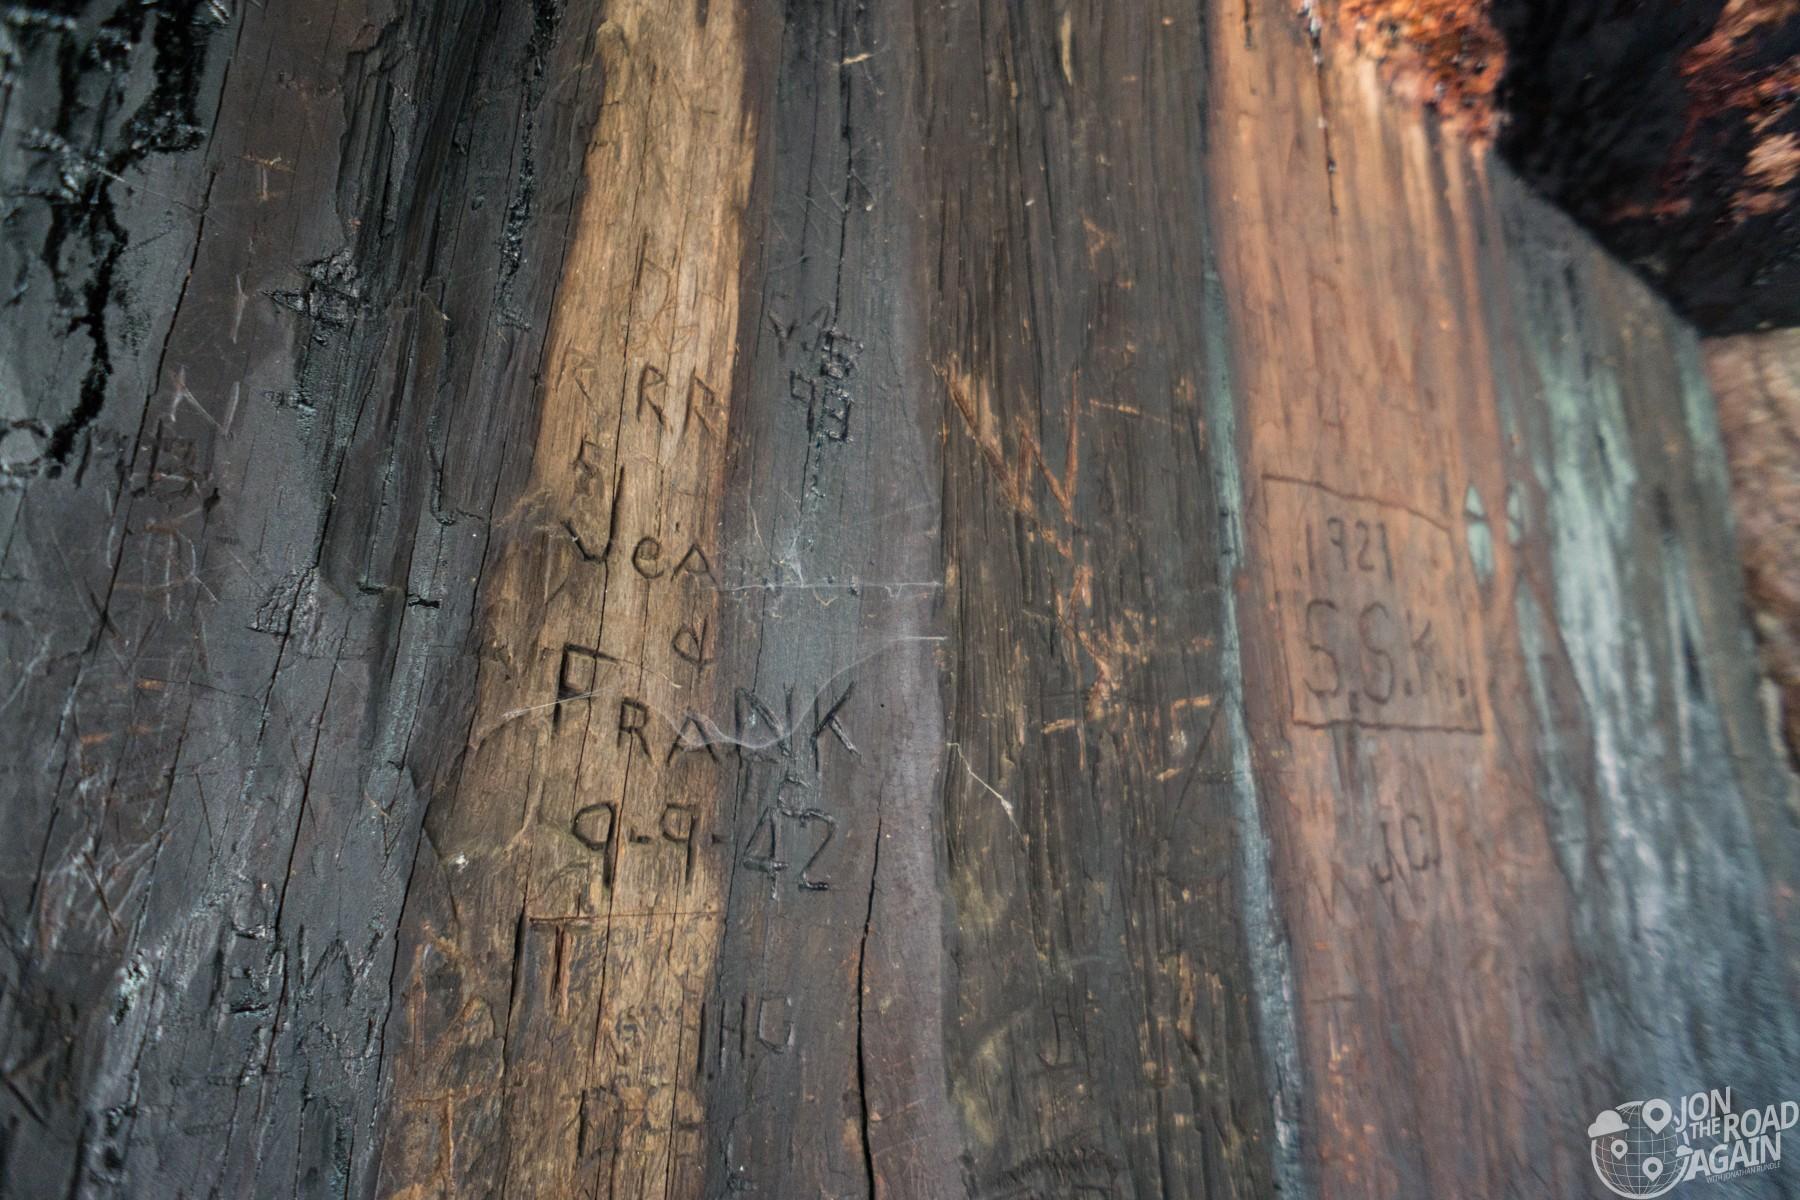 California Tunnel Tree carvings Yosemite